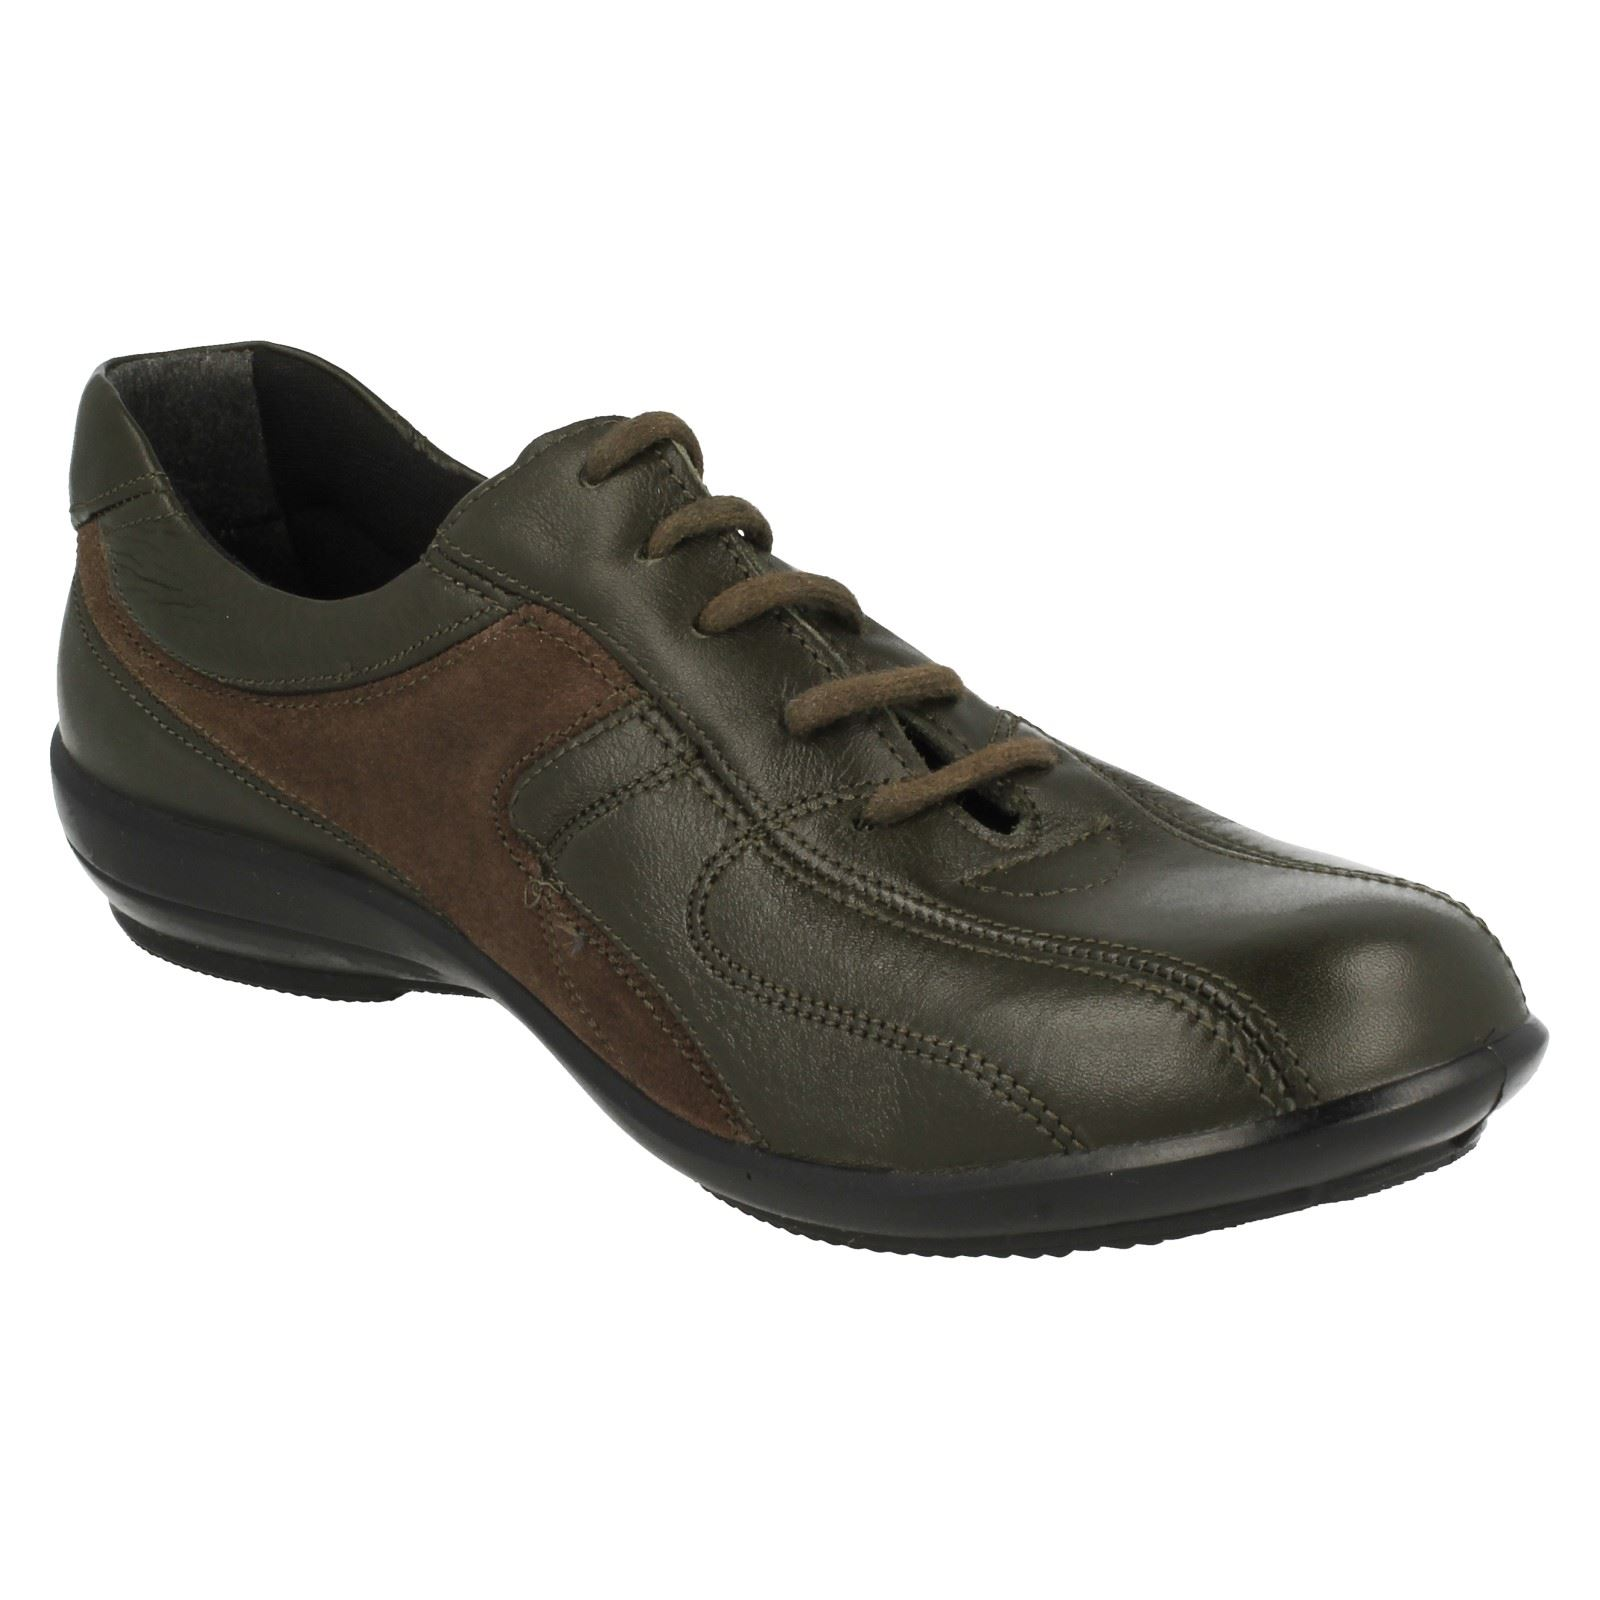 Femmes easy b lacets chaussures de loisirs emma